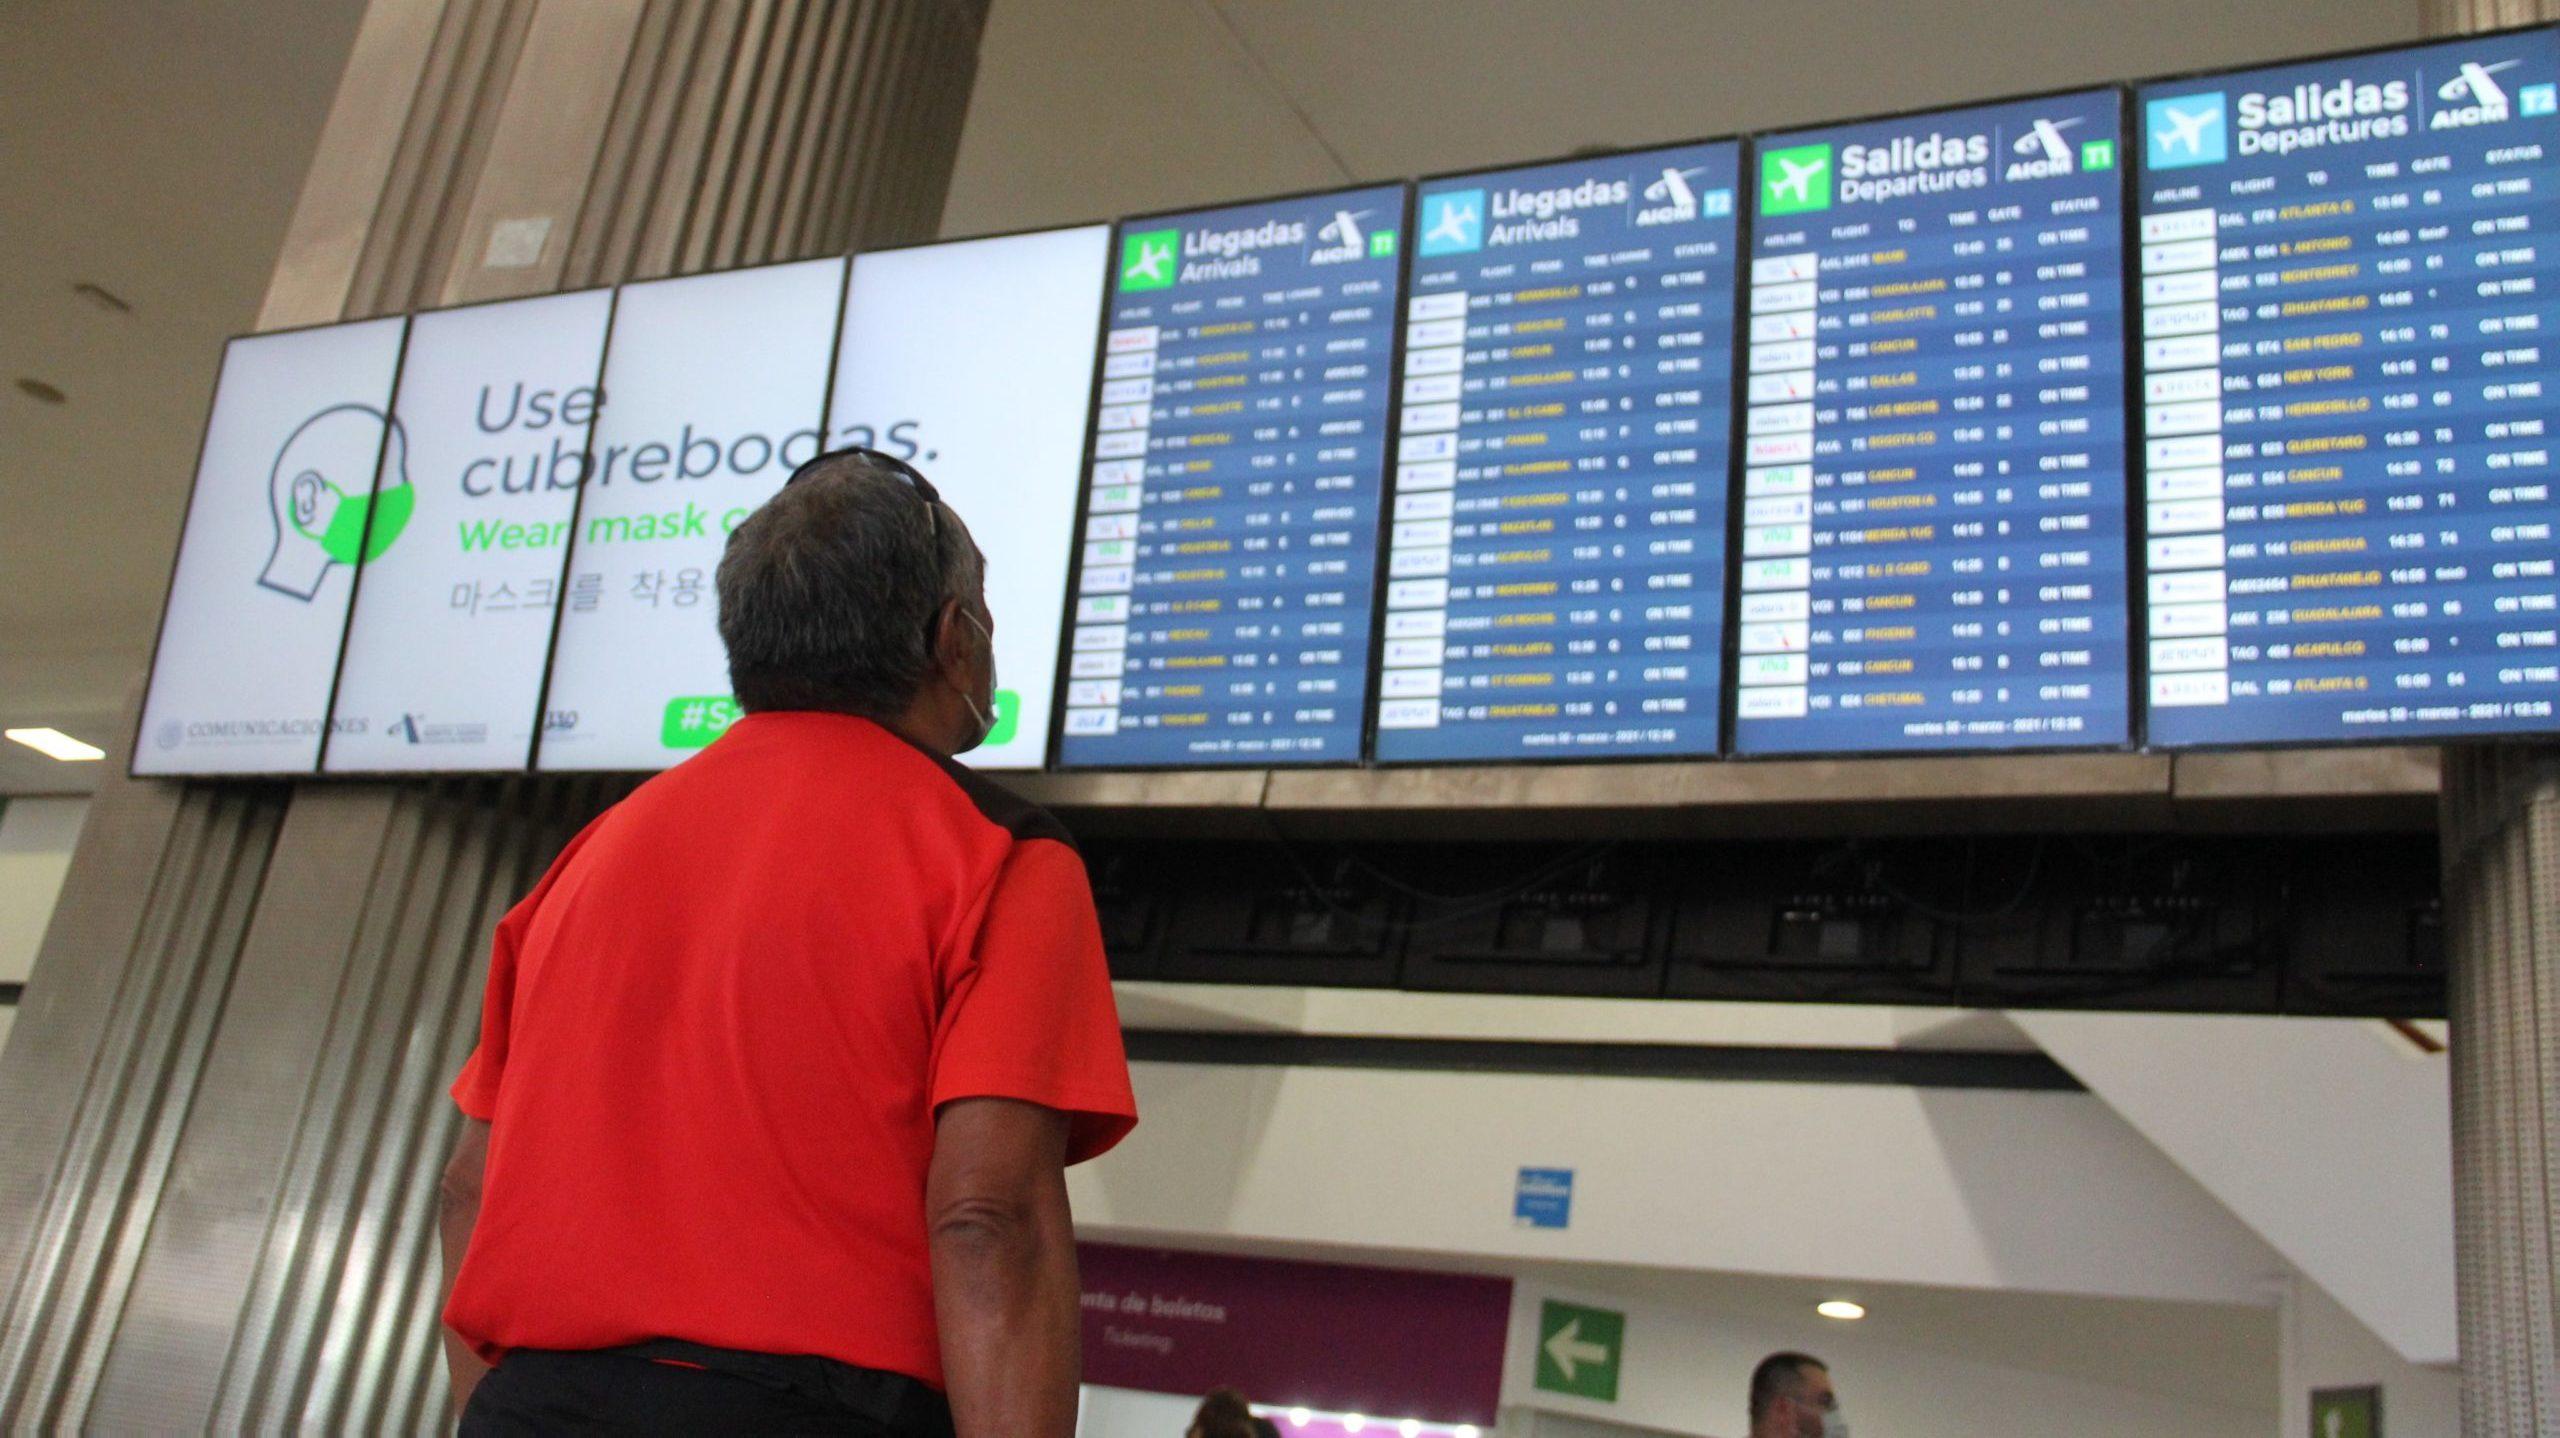 AICM da descuentos a aerolíneas y empresas para sobrevivir a pandemia